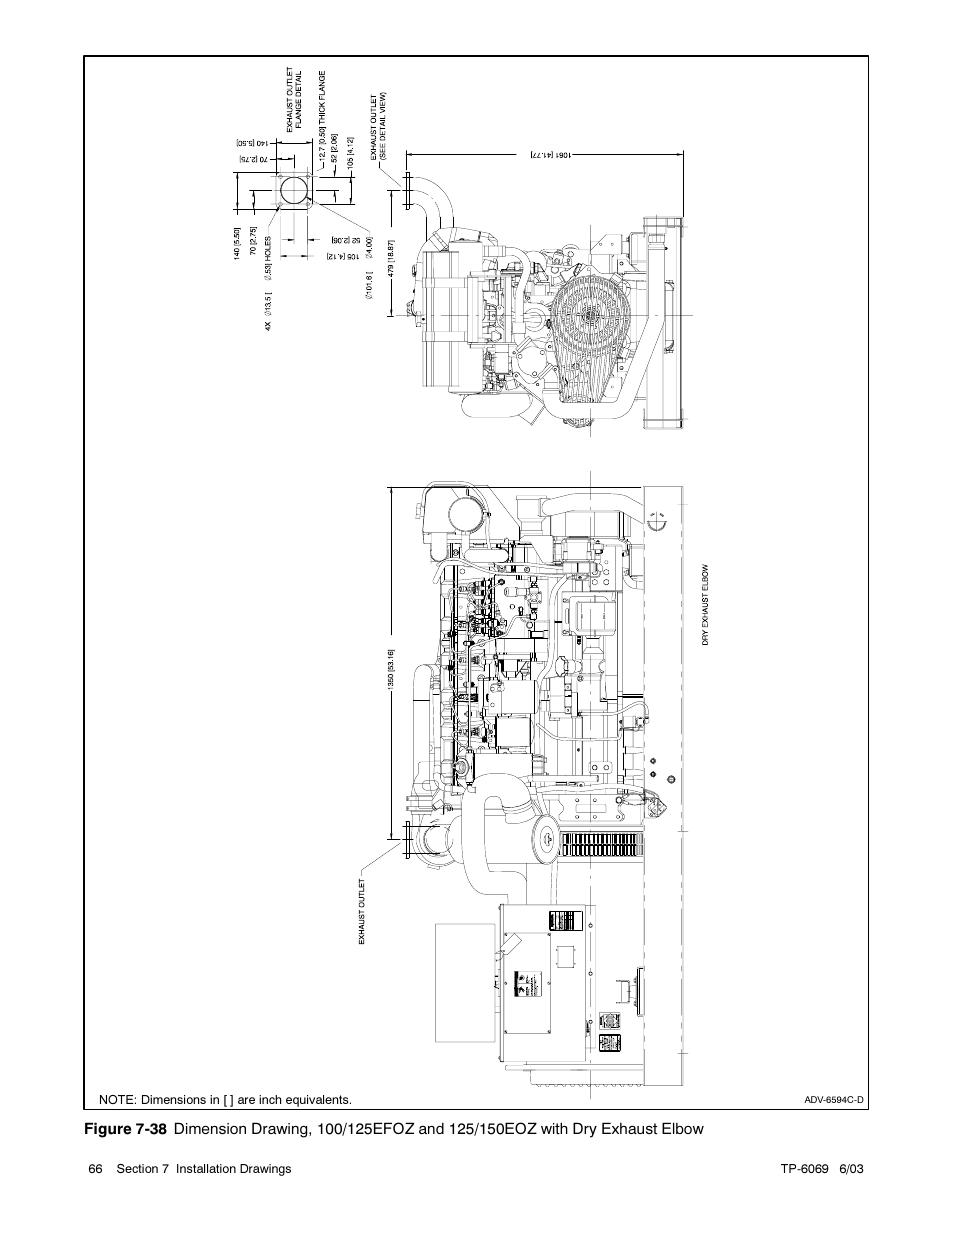 Kohler Generator Manuals 8eoz Quick Start Guide Of Wiring Diagram Marine Sets 11efoz 13eoz User Manual Page 76 92 Rh Manualsdir Com Old